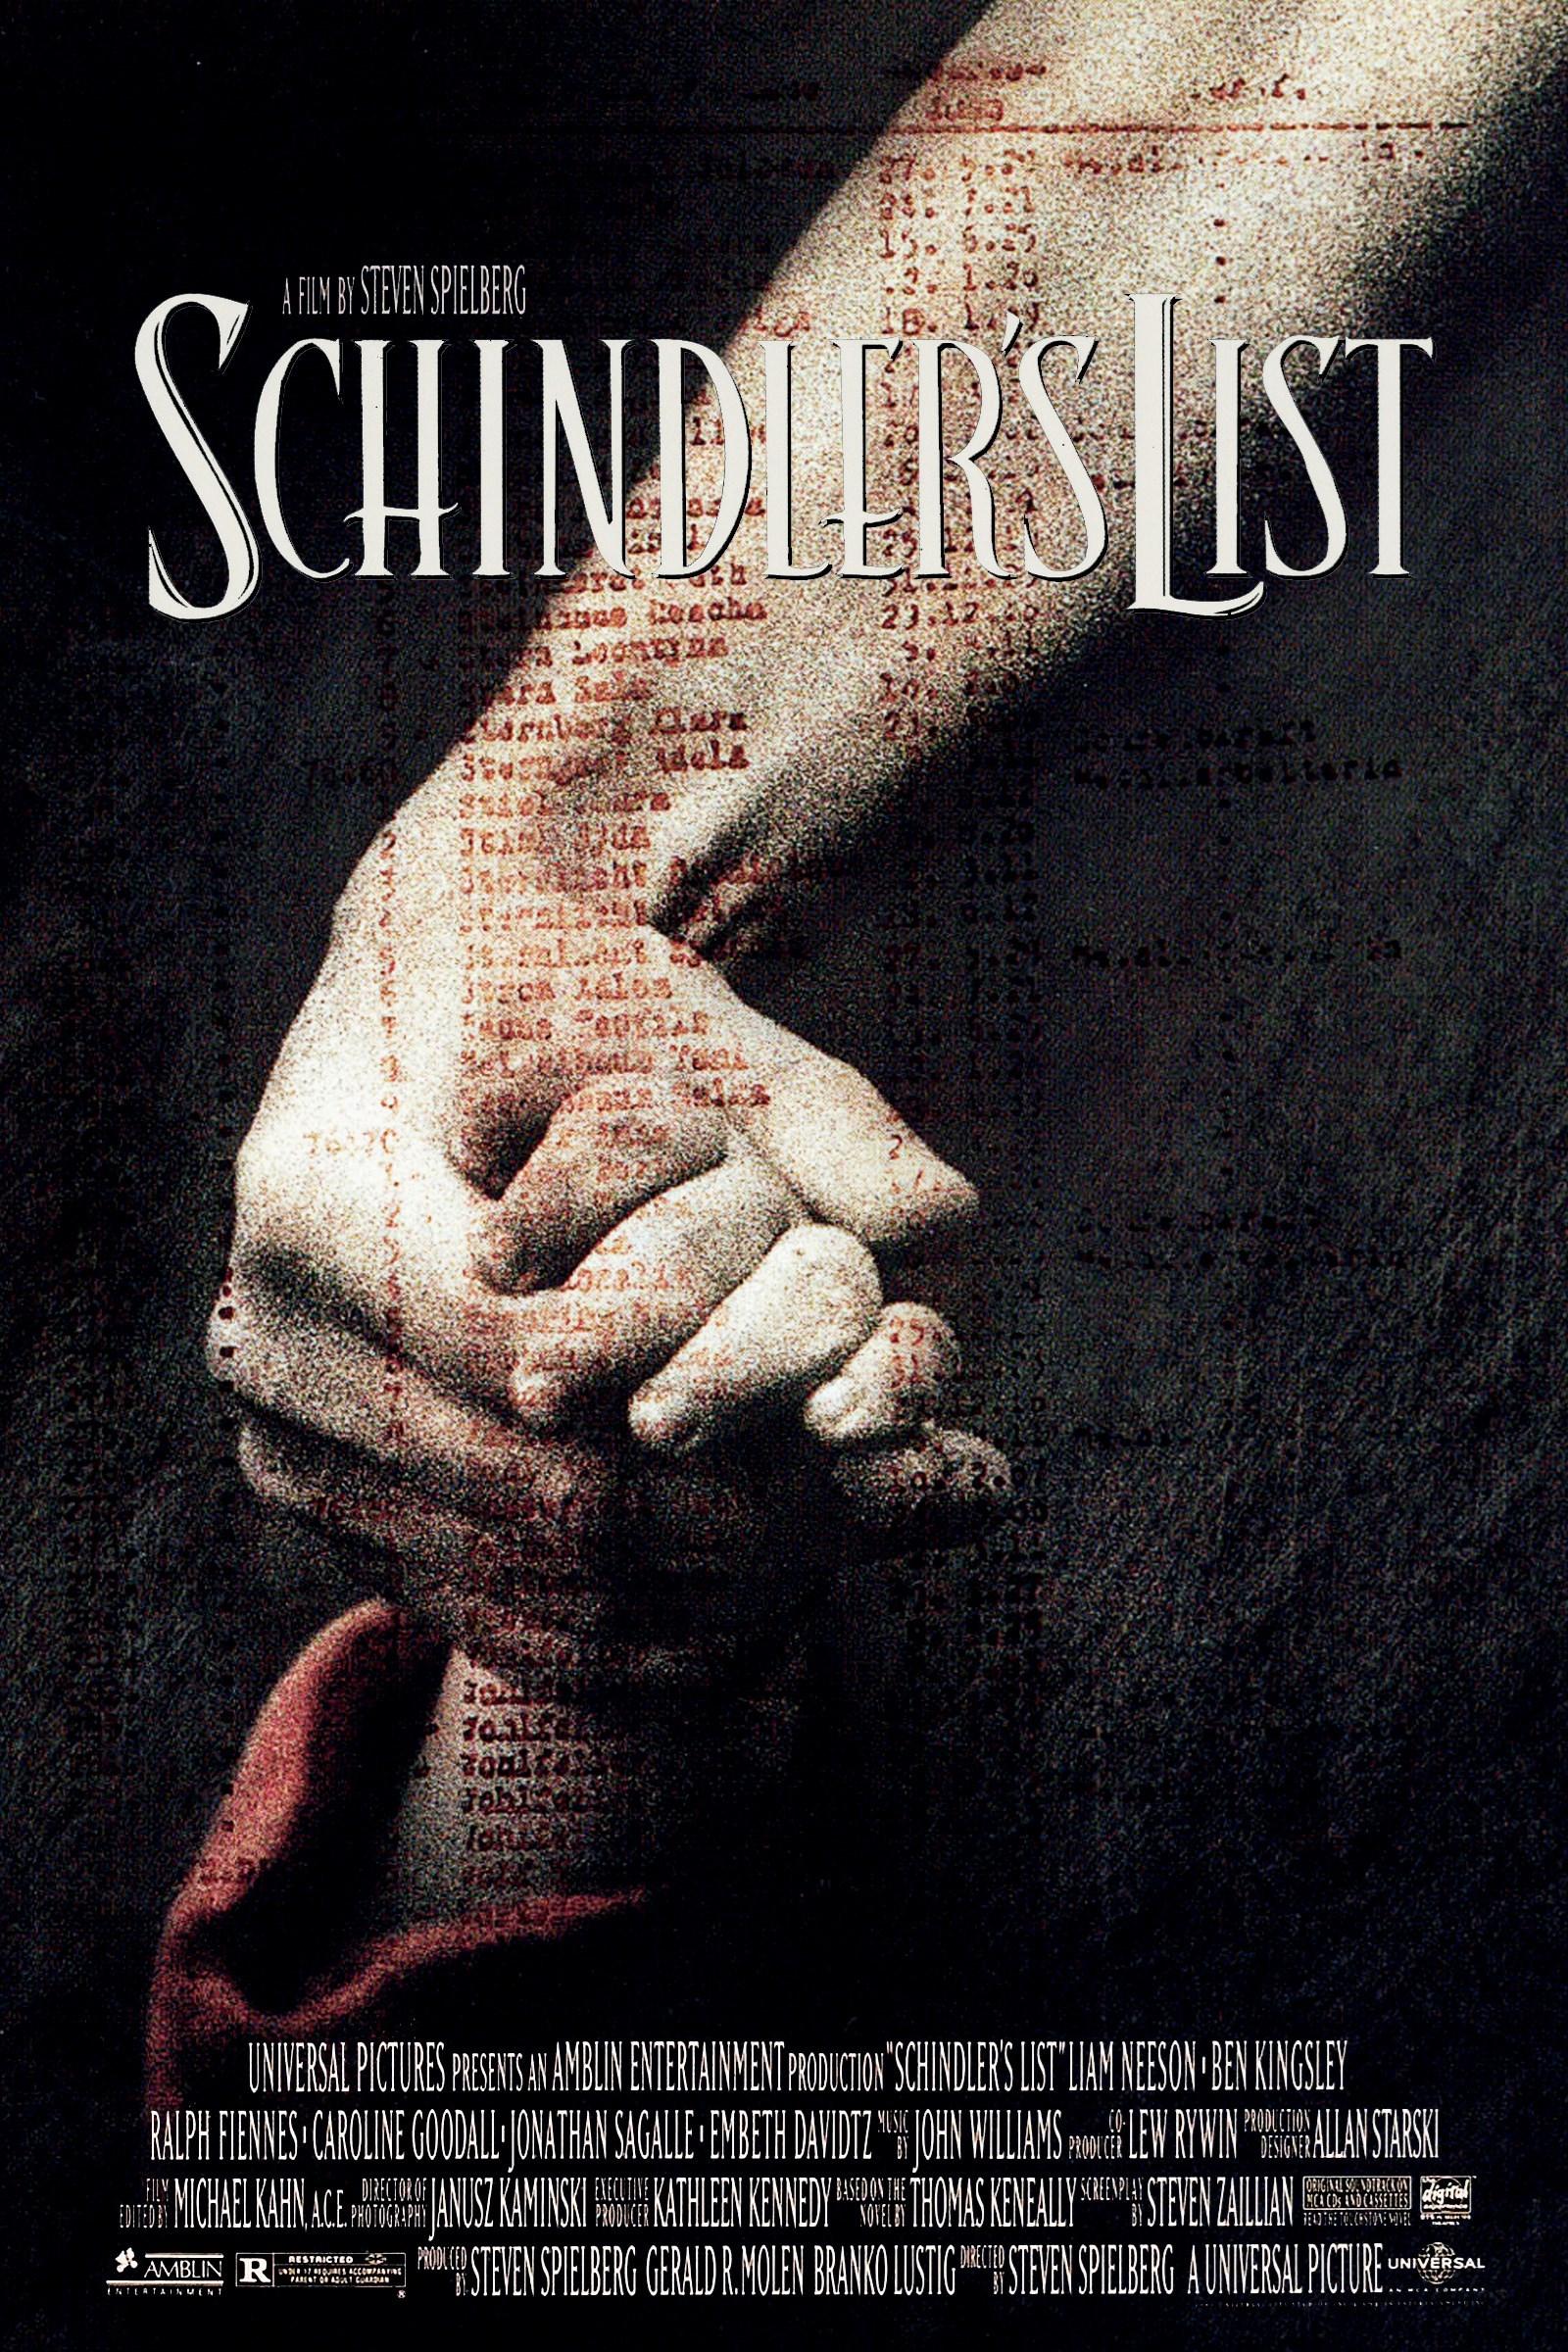 Schindler's List DVD cover